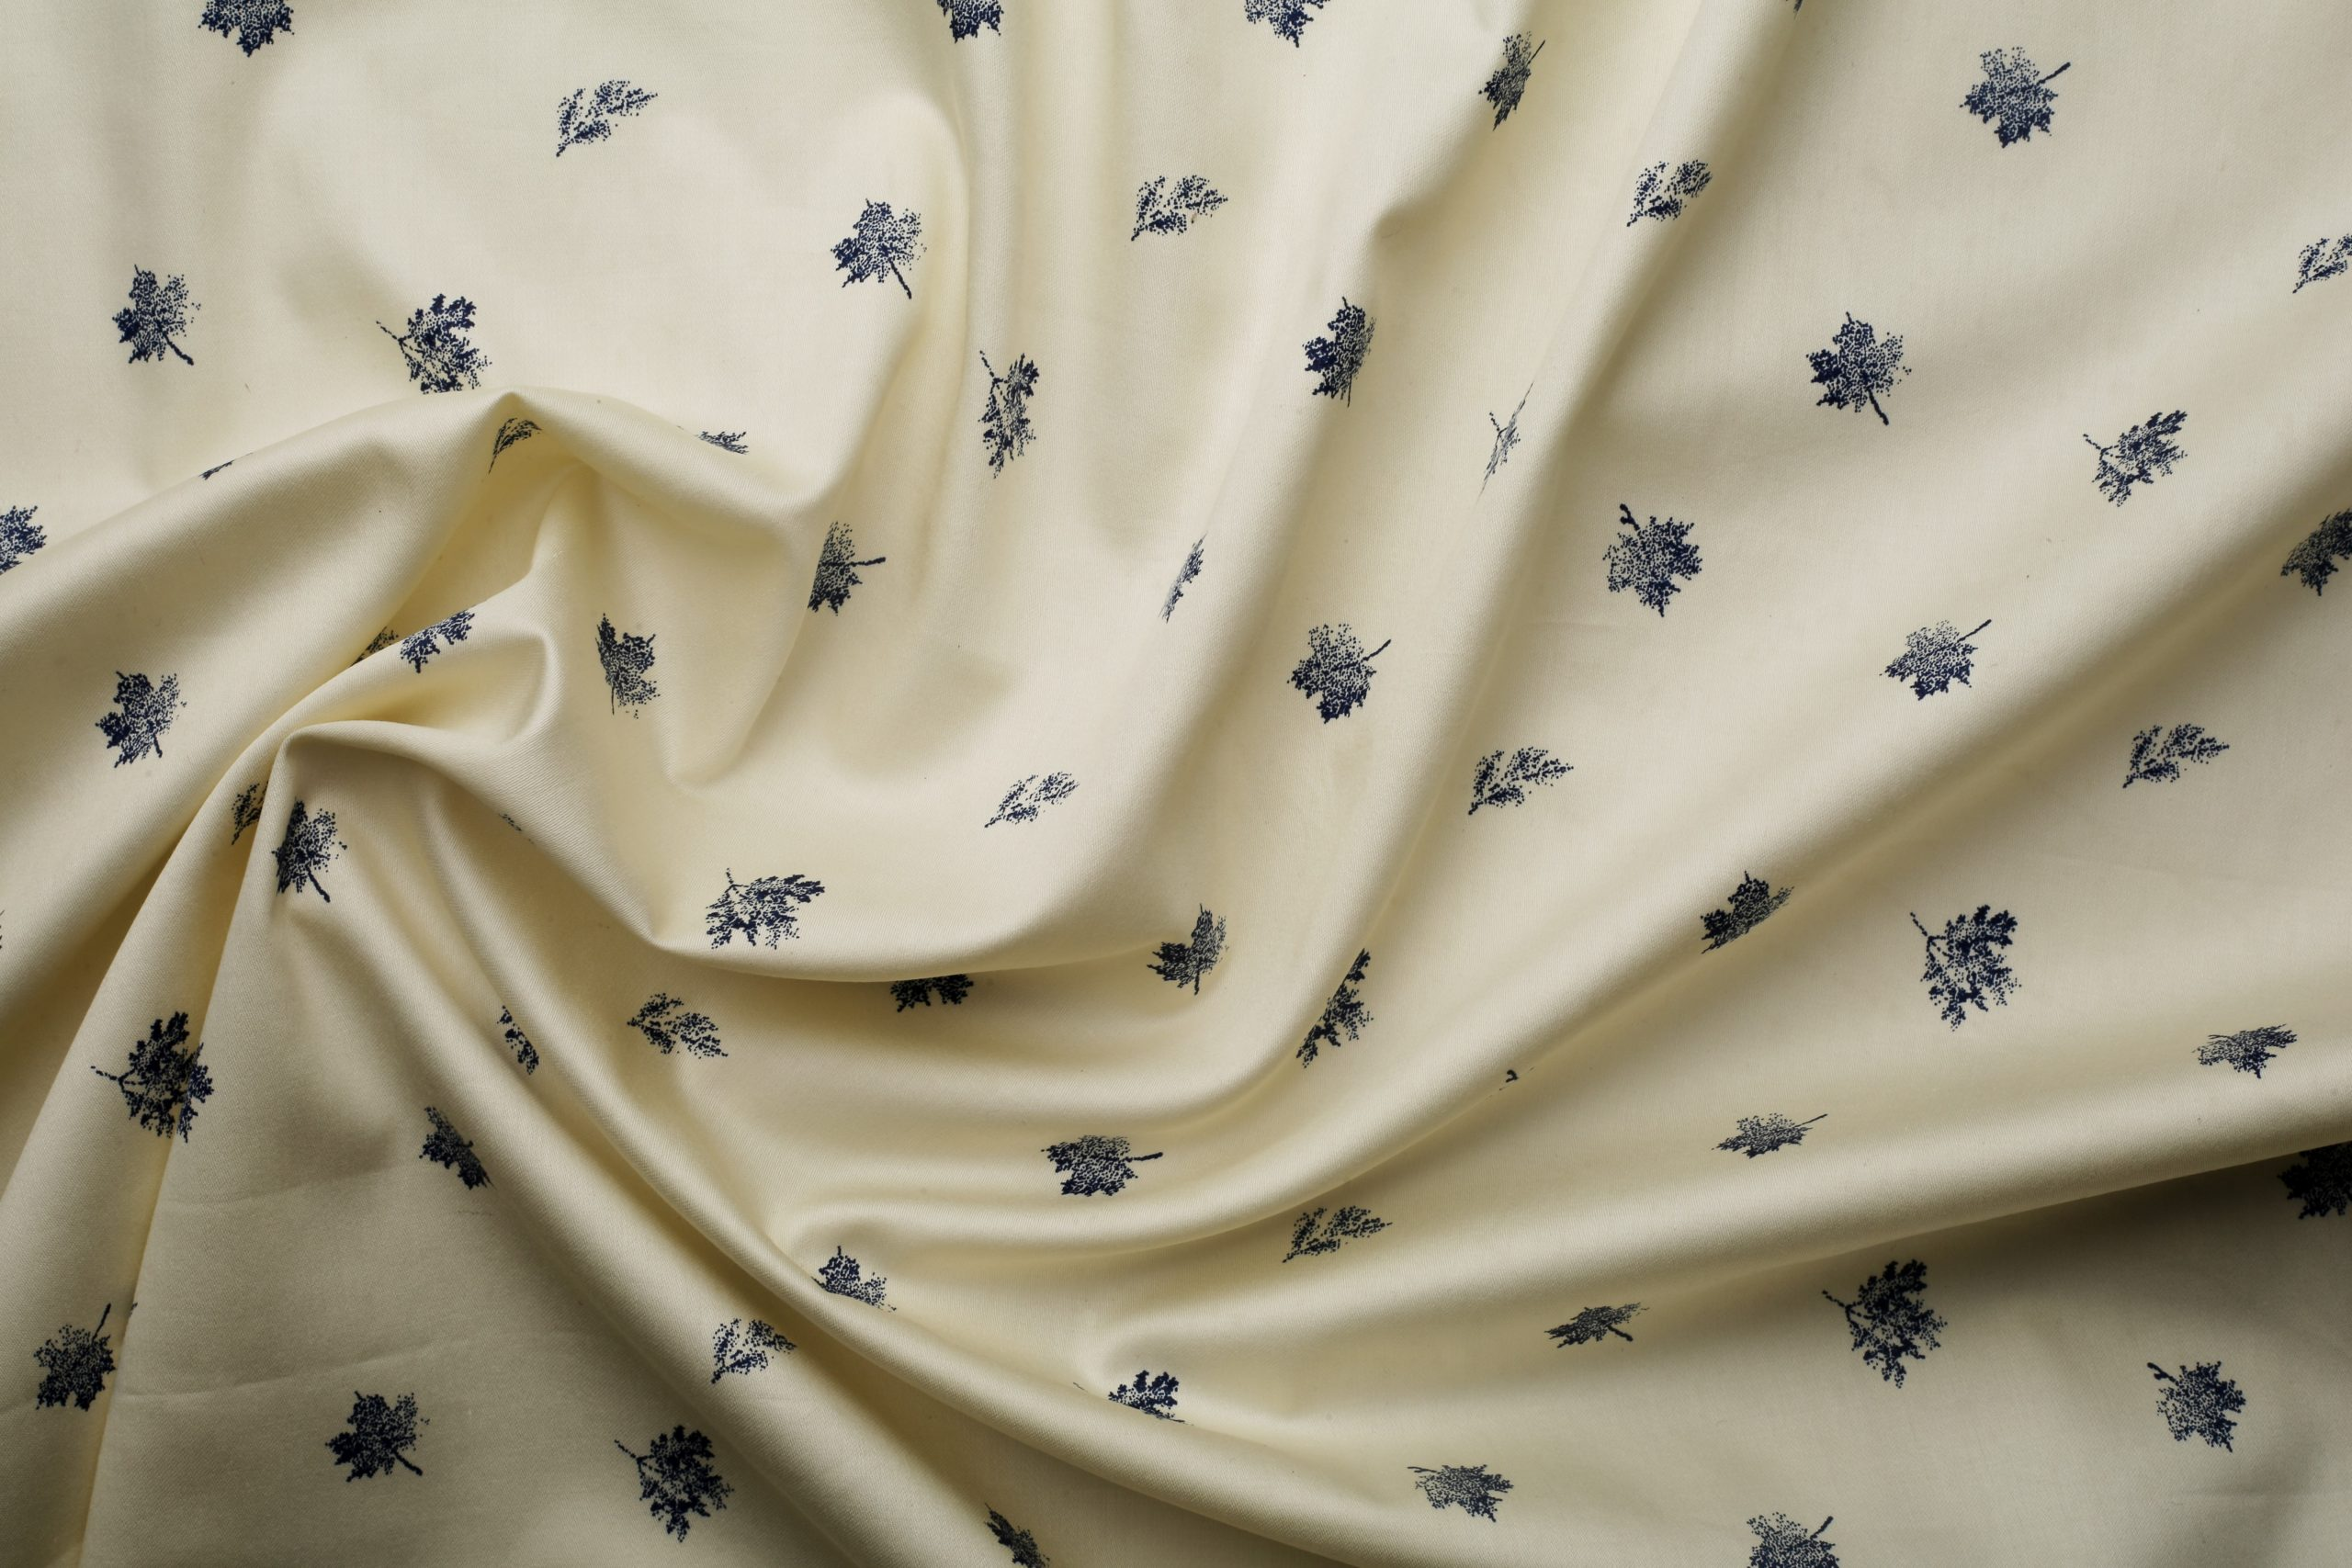 formal shirting print shirt fabric